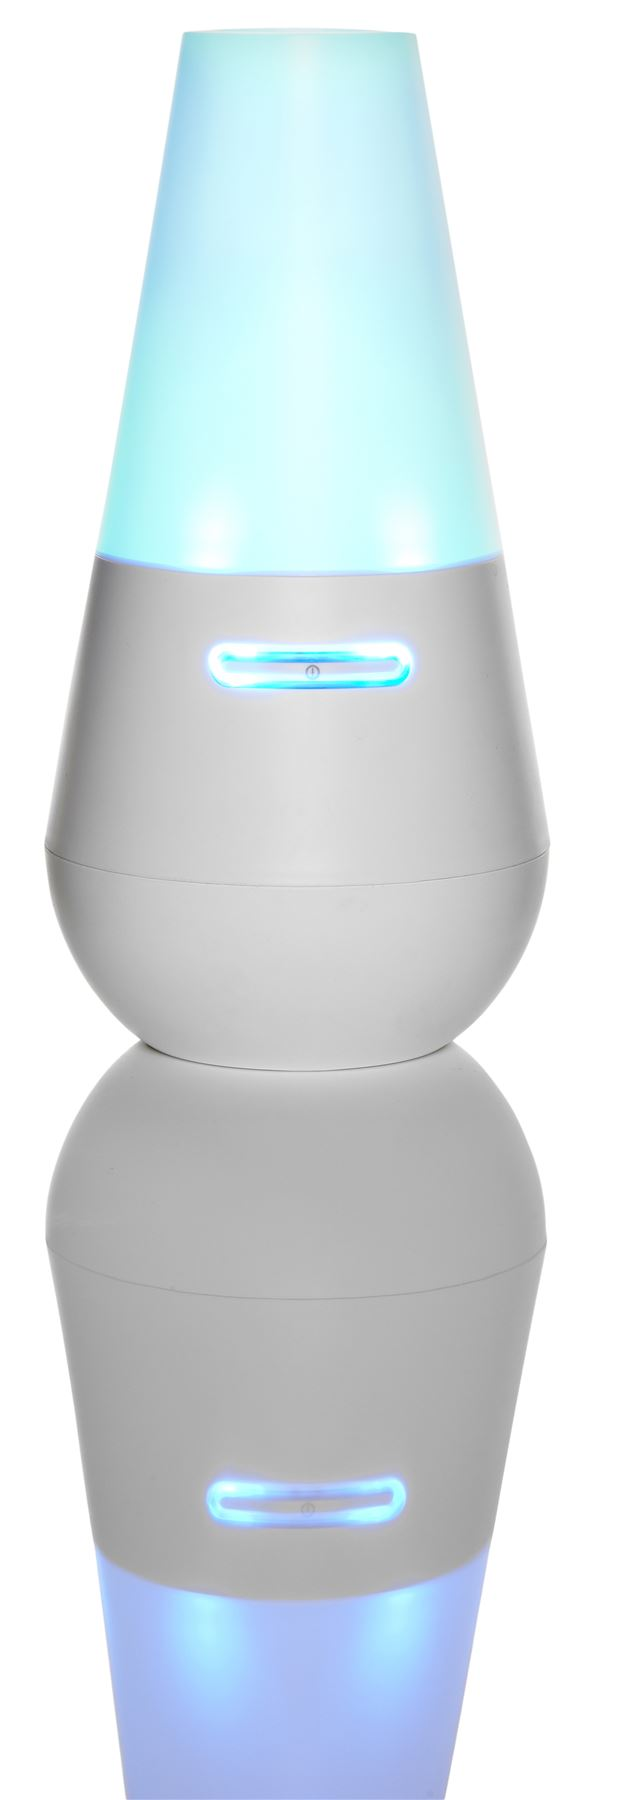 Aroma Diffuser White Base, Blue Light madebyzen Enso